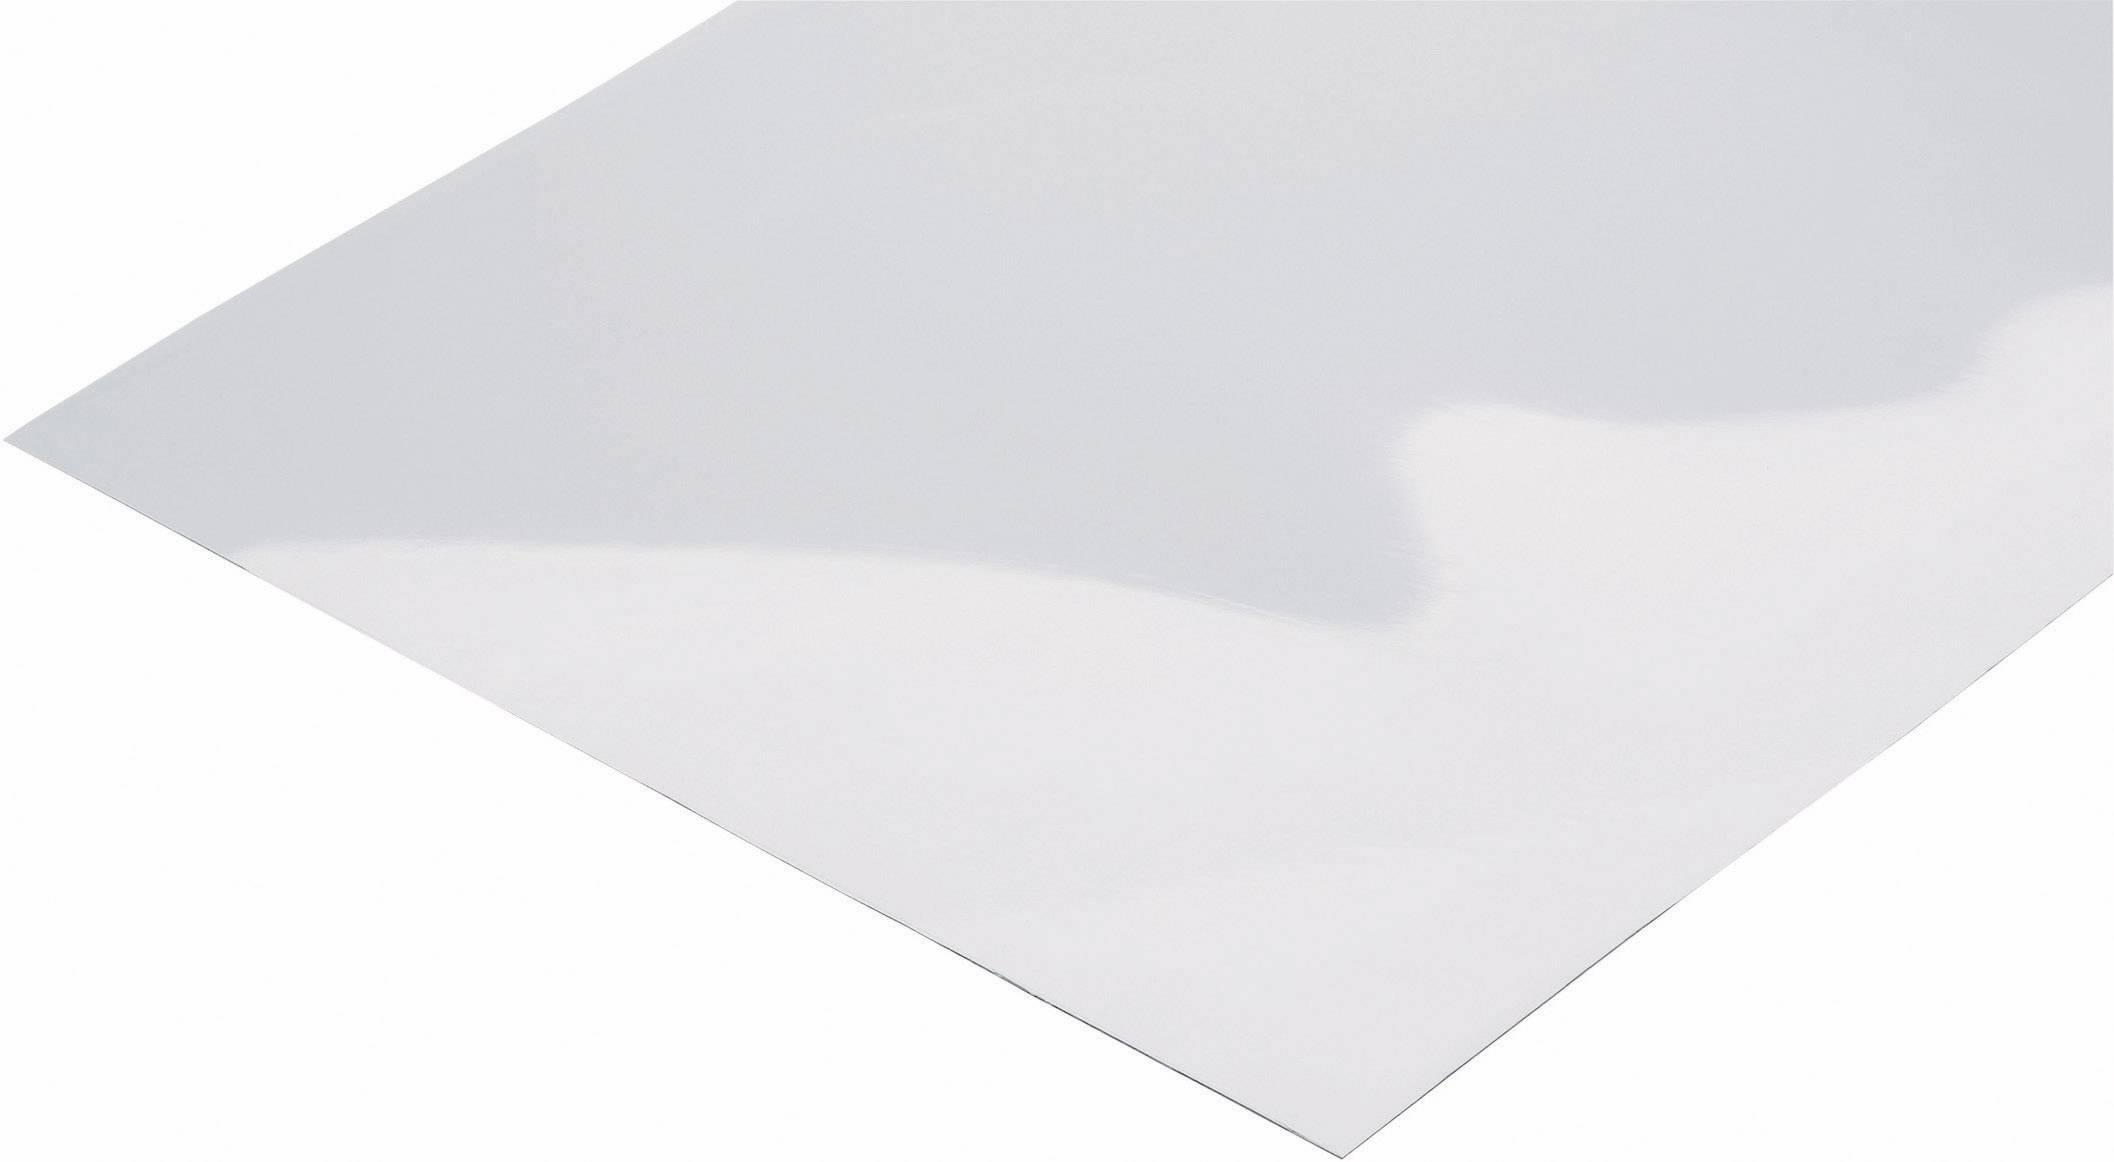 Polykarbonátová deska Modelcraft 400 x 500 x 1 mm